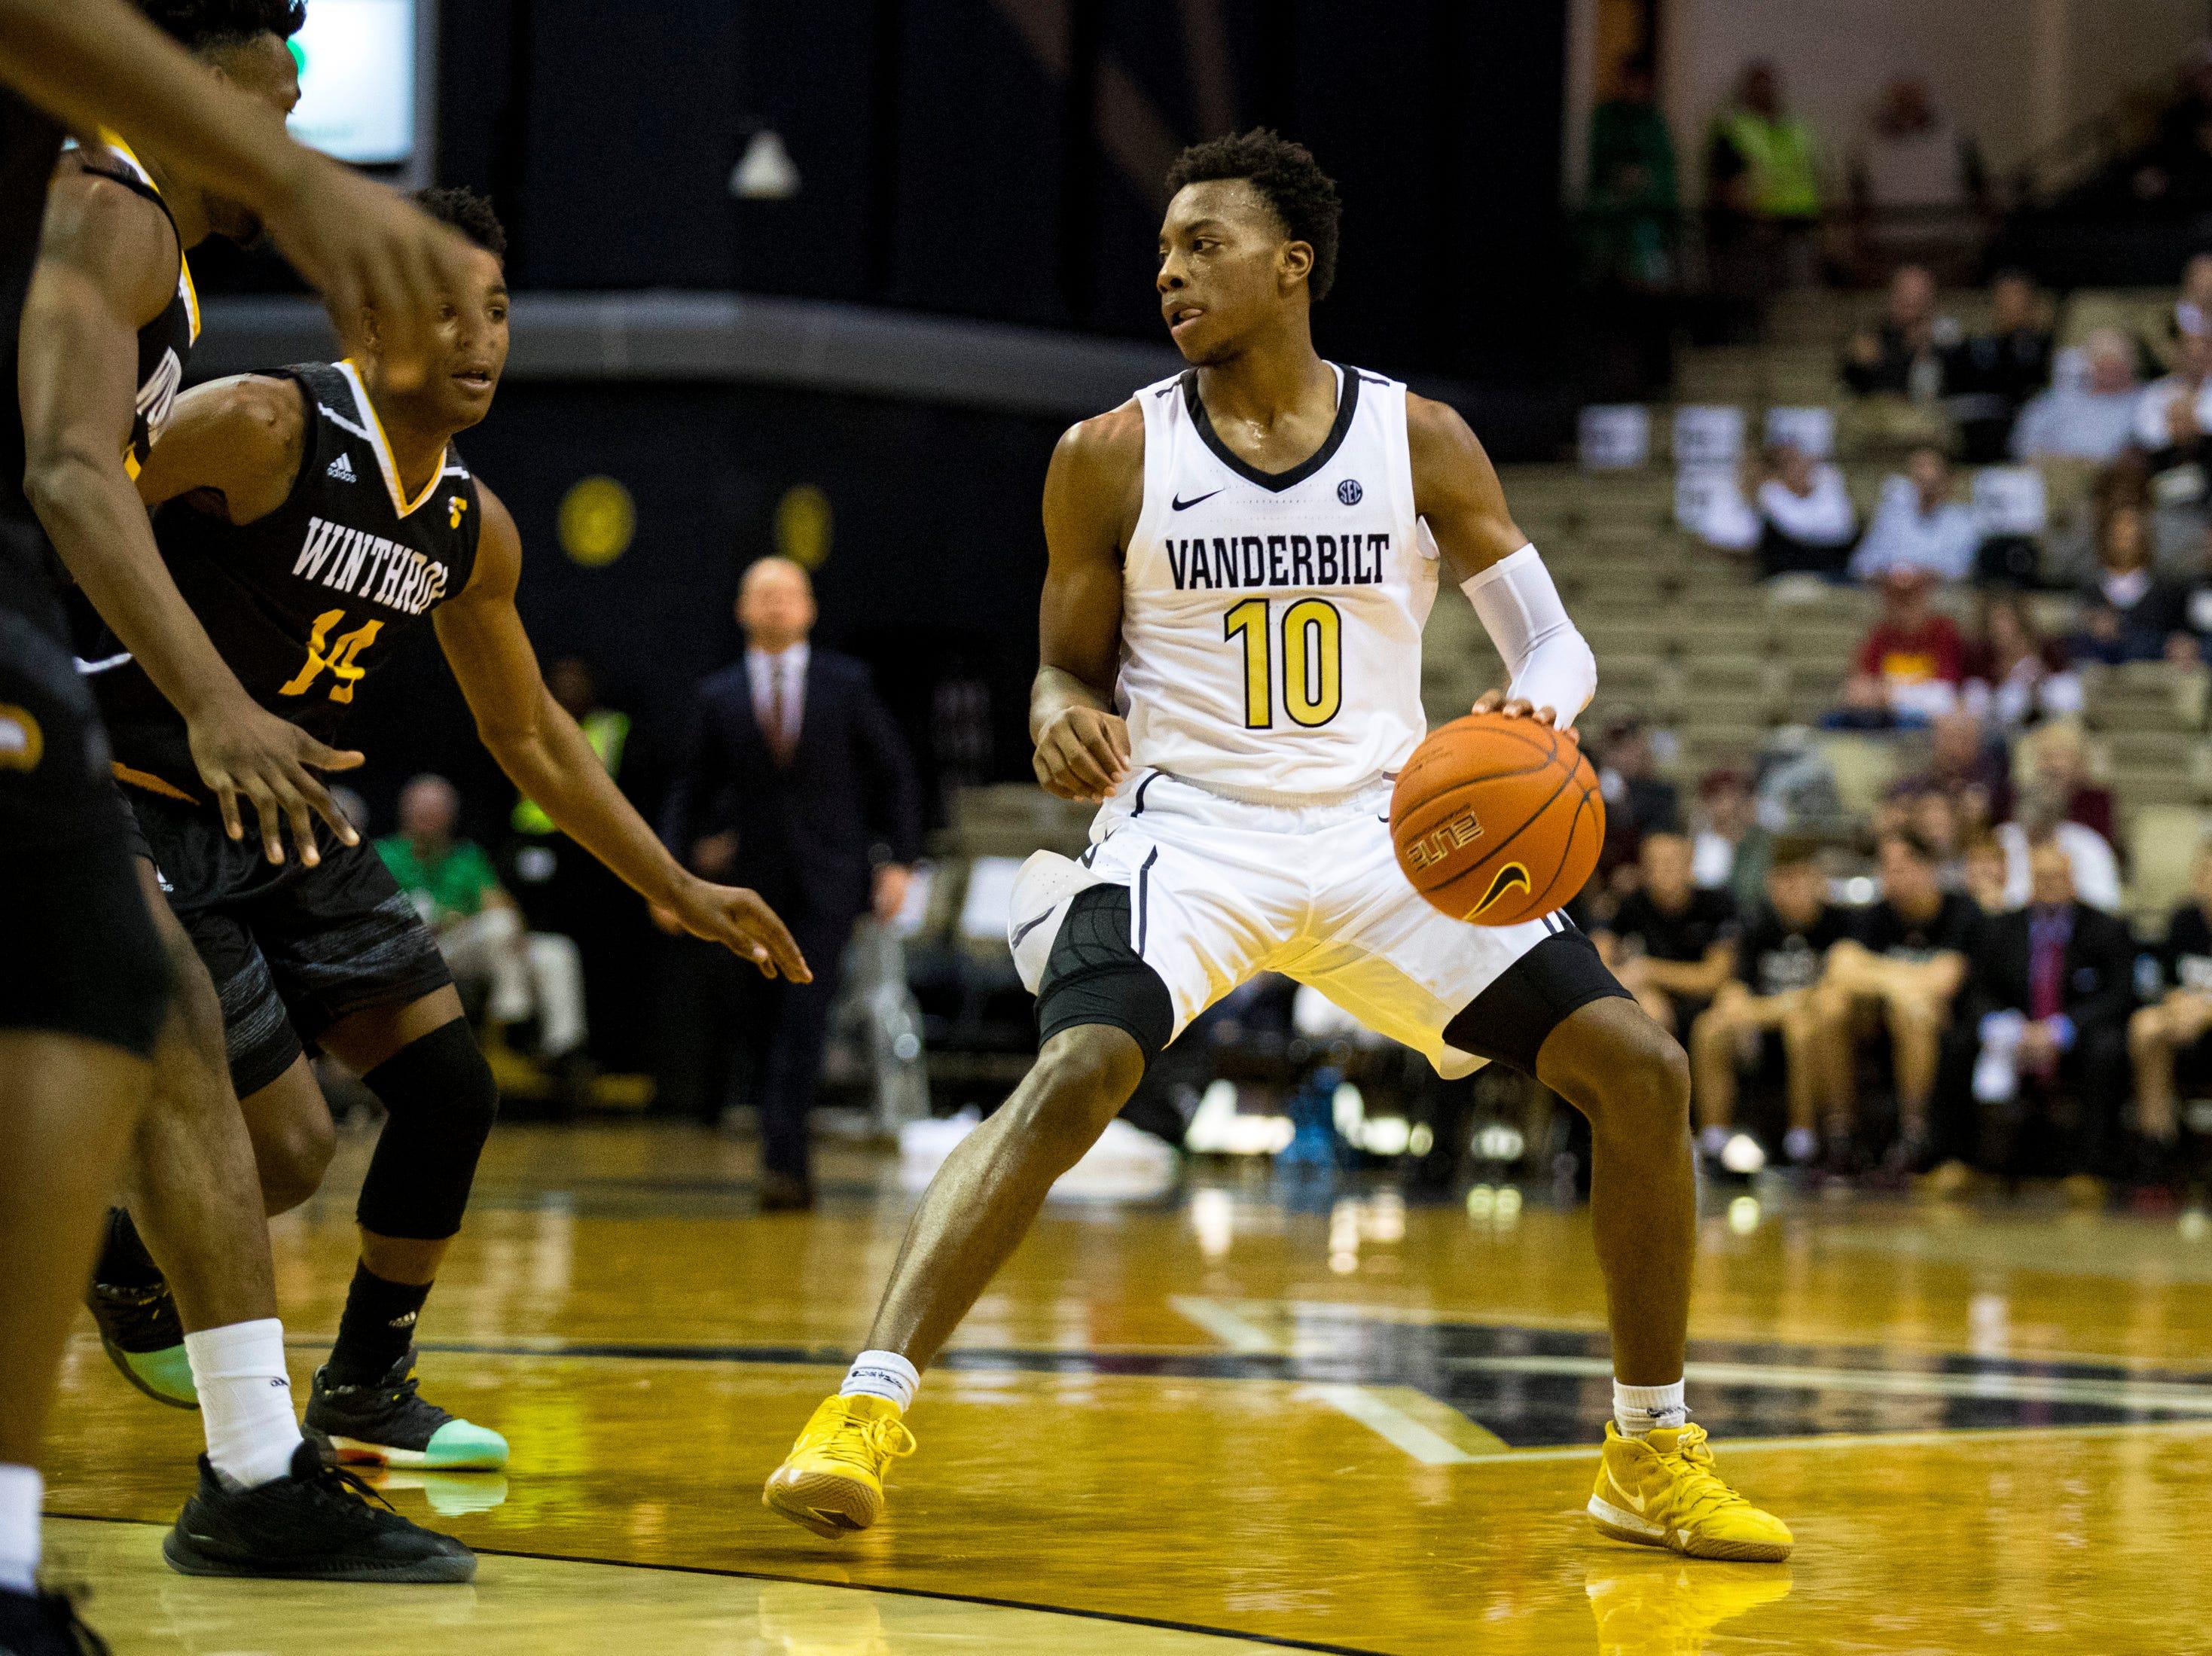 Vanderbilt's Darius Garland (10) dribbles during Vanderbilt's game against Winthrop at Memorial Gymnasium in Nashville on Tuesday, Nov. 6, 2018.